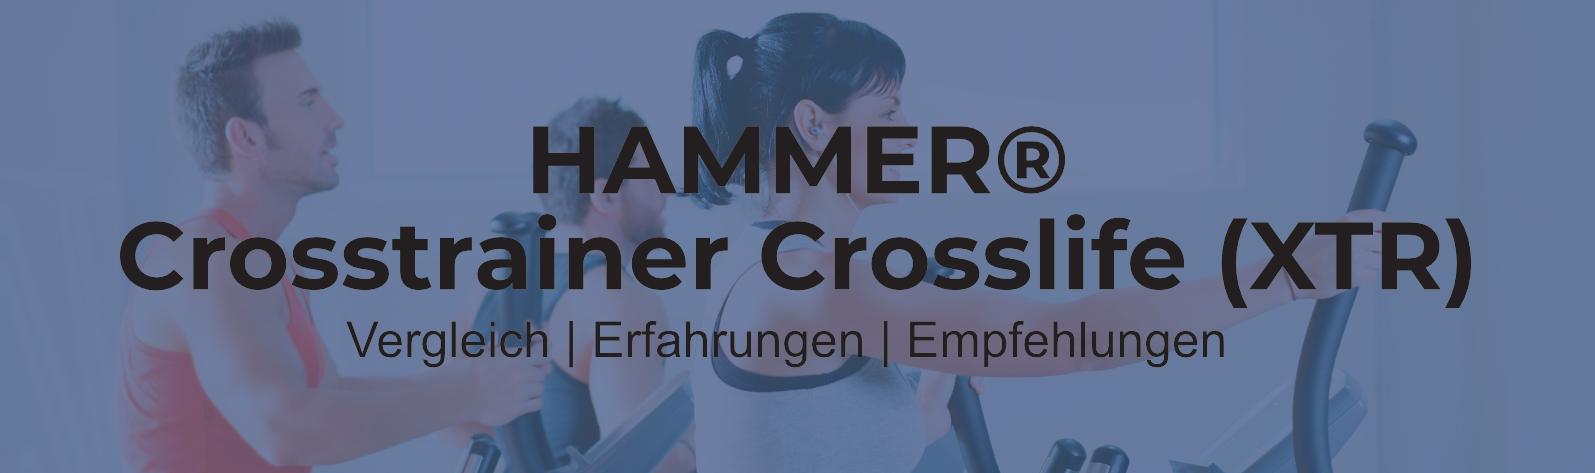 Hammer Crosstrainer Crosslife XTR & Vergleich der Hammer-Crosstrainer